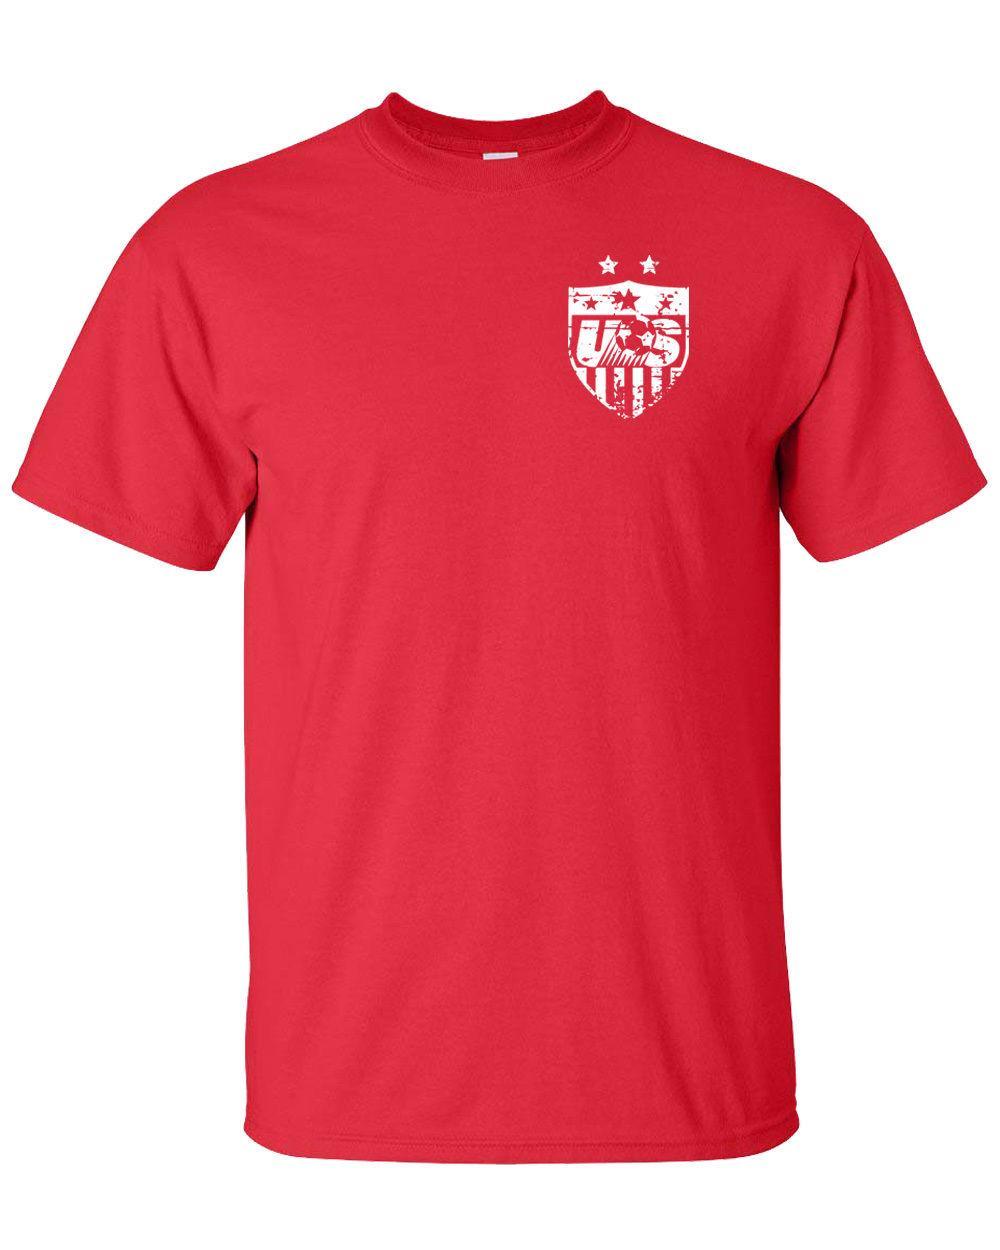 d534b24b184 ... Shirt Source · ALEX MORGAN United States Women S Soccer Team 2 Sides  MEN S Tee